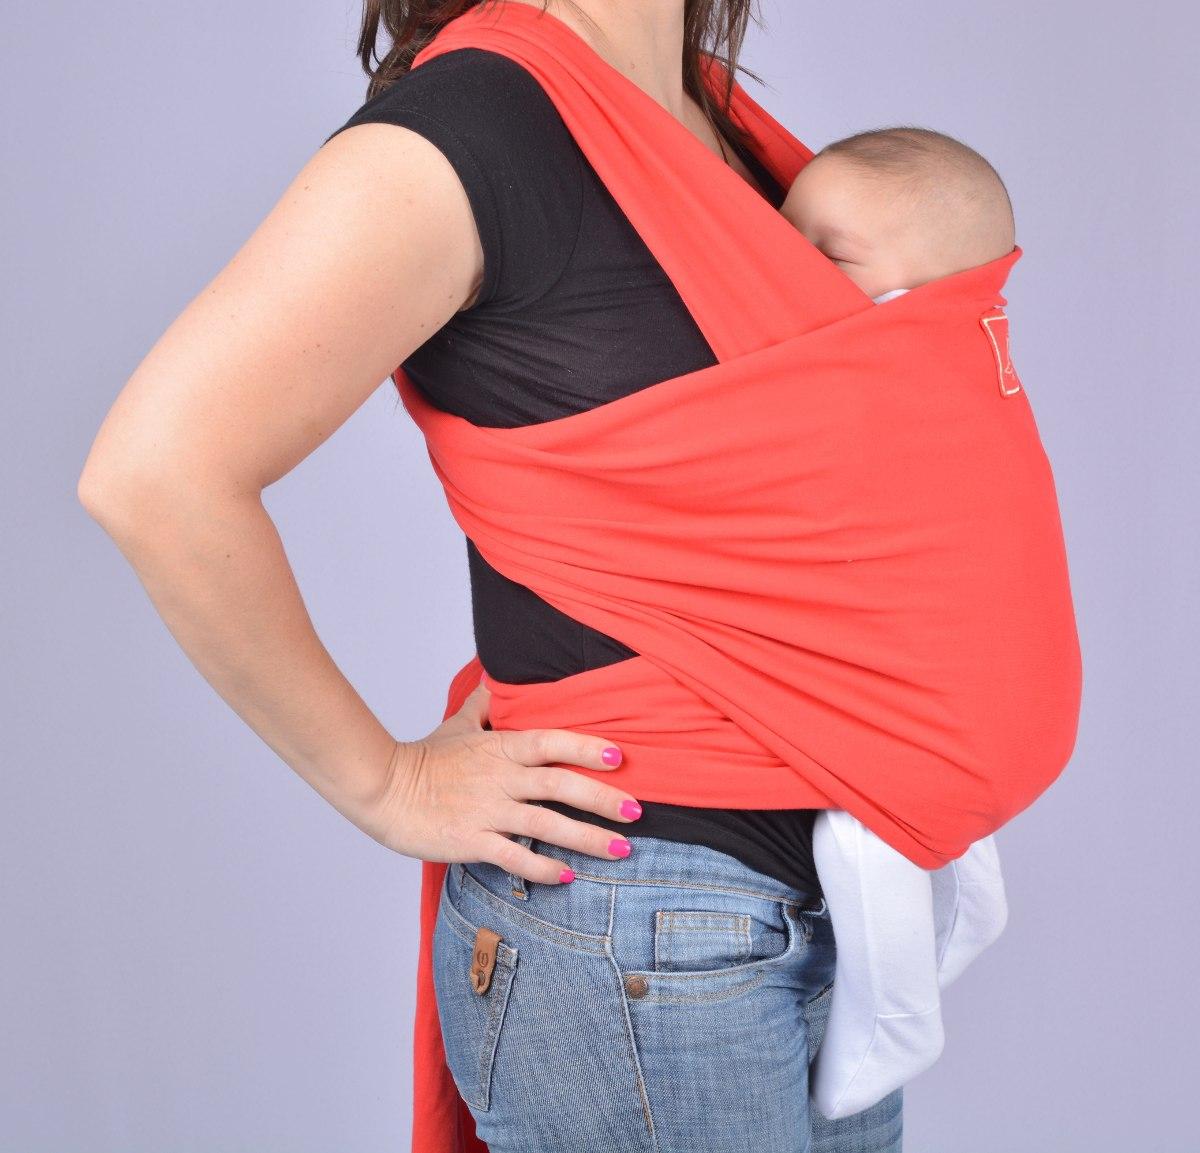 Fular Mochila Portabebé 20kilos Baby Soft Tela Elástica Zsur